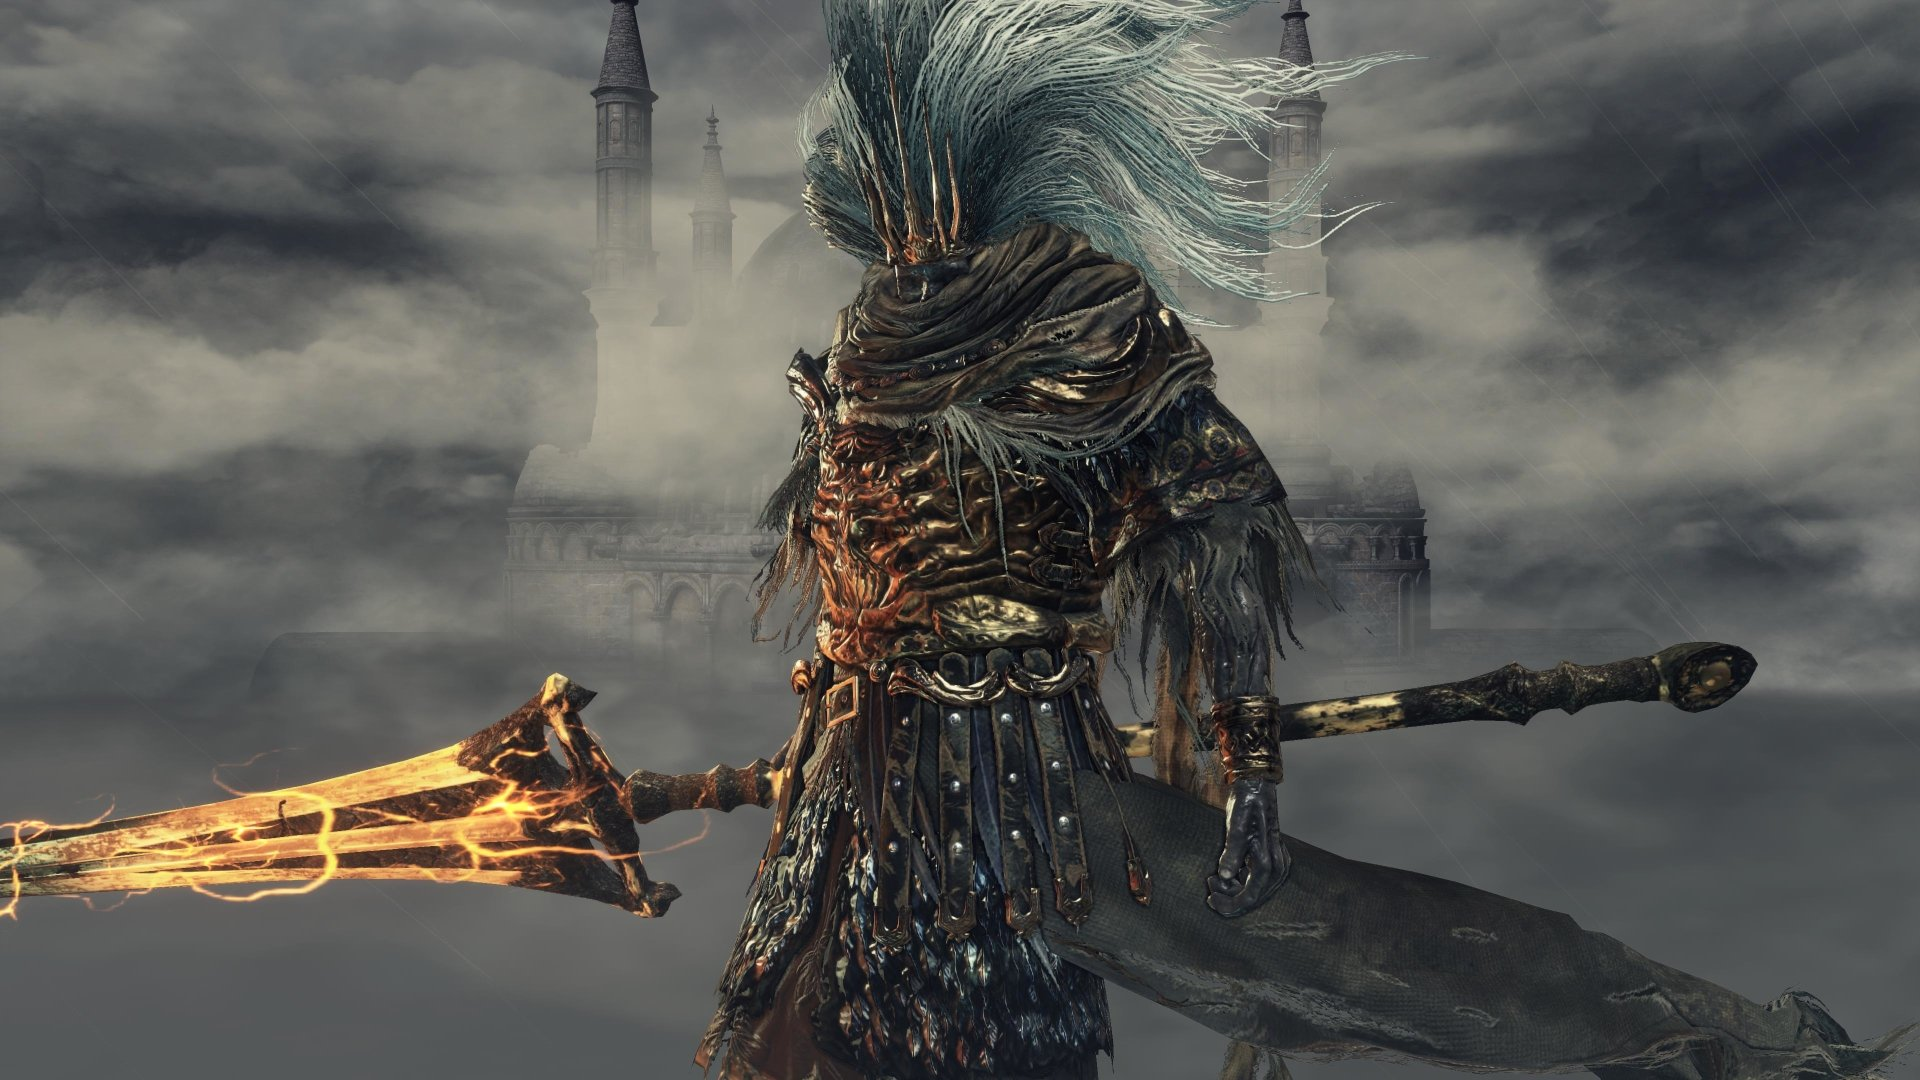 Dark Souls 3 Pic 4 4k Ultra HD Wallpaper